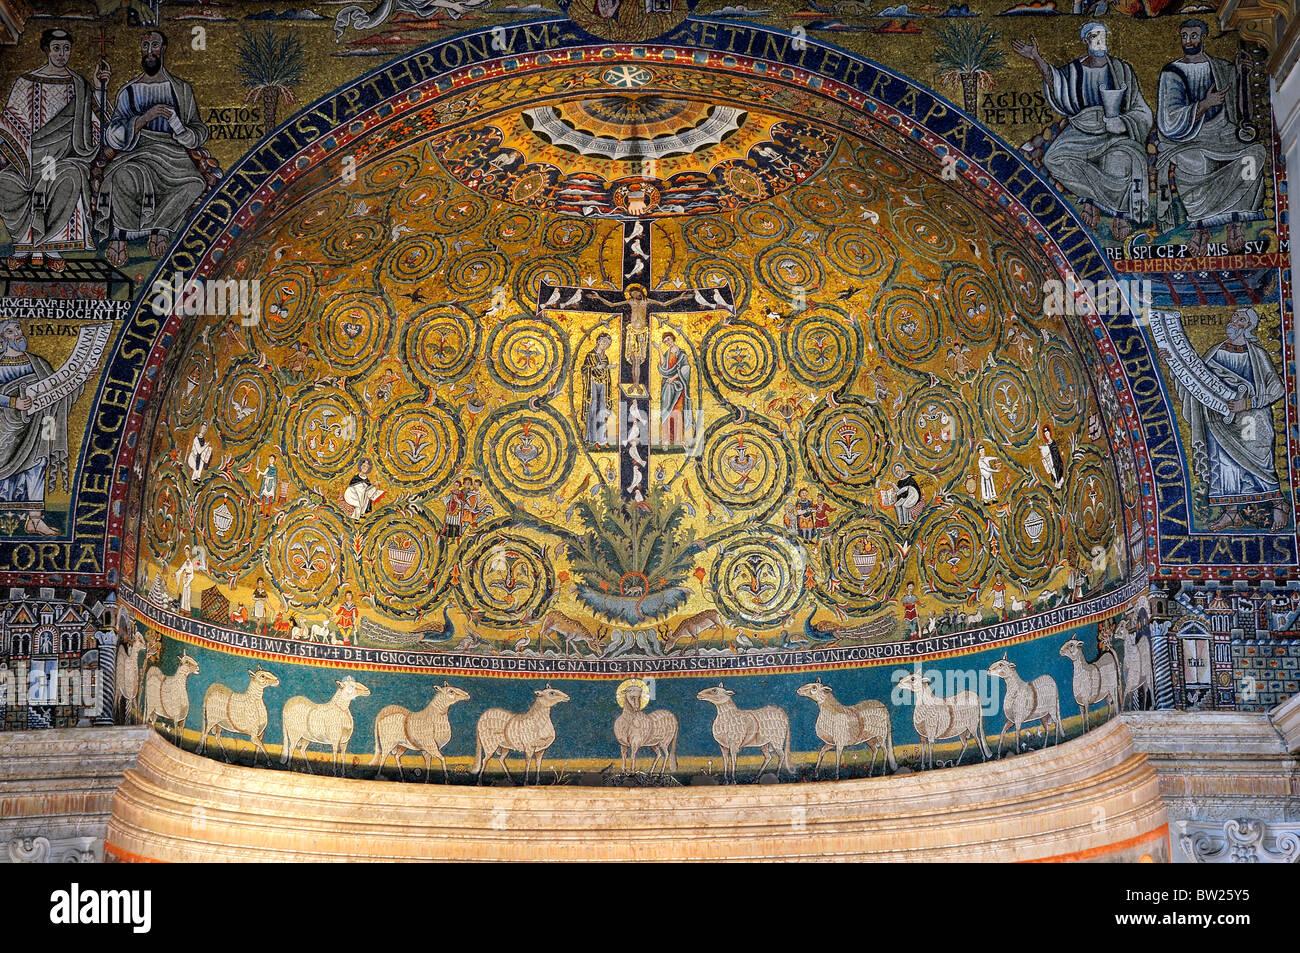 Triumph of the Cross, Apse mosaics, Basilica San Clemente Stock Photo